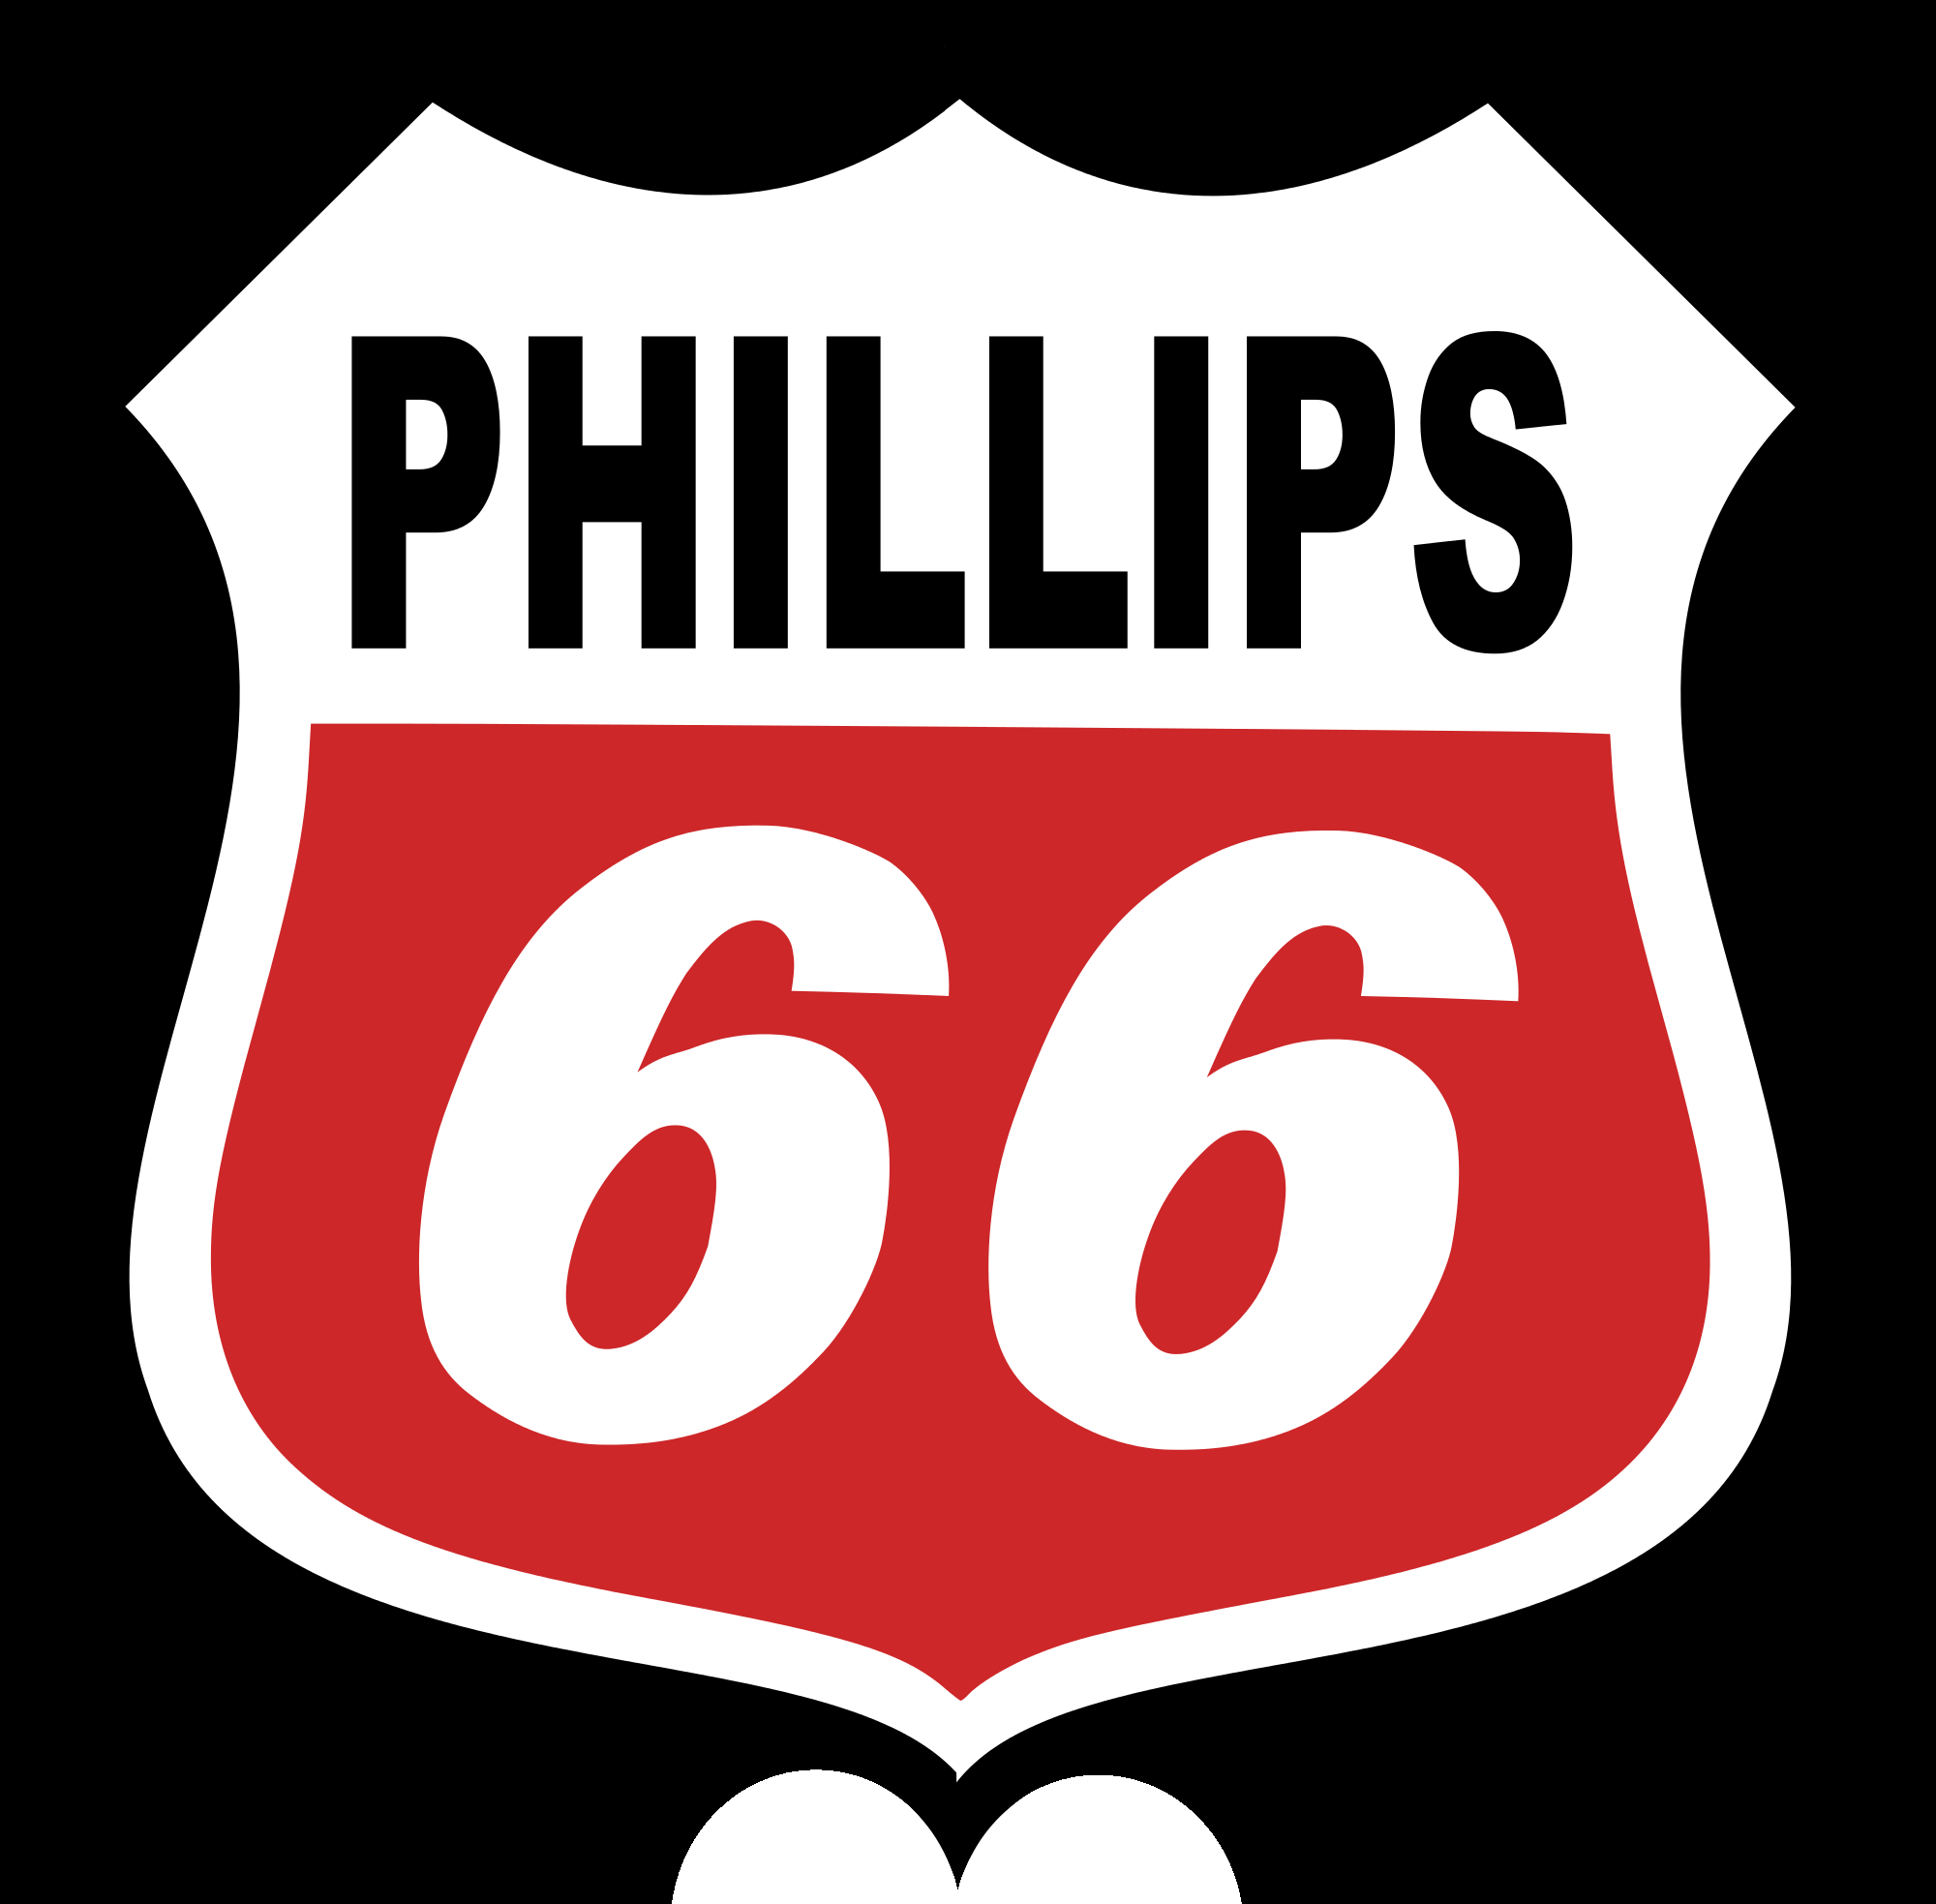 Phillips 66 Magnus Oil 32 Cross Reference